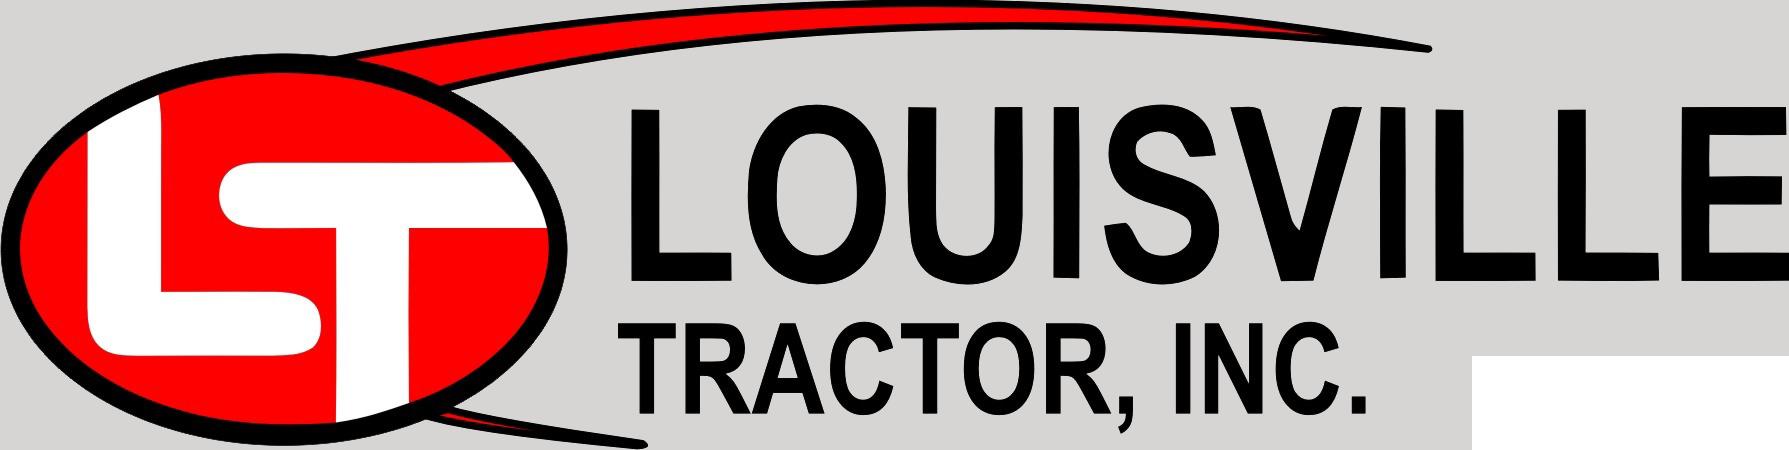 Lawnmower clipart mower john deere. Louisville tractor scag ferris